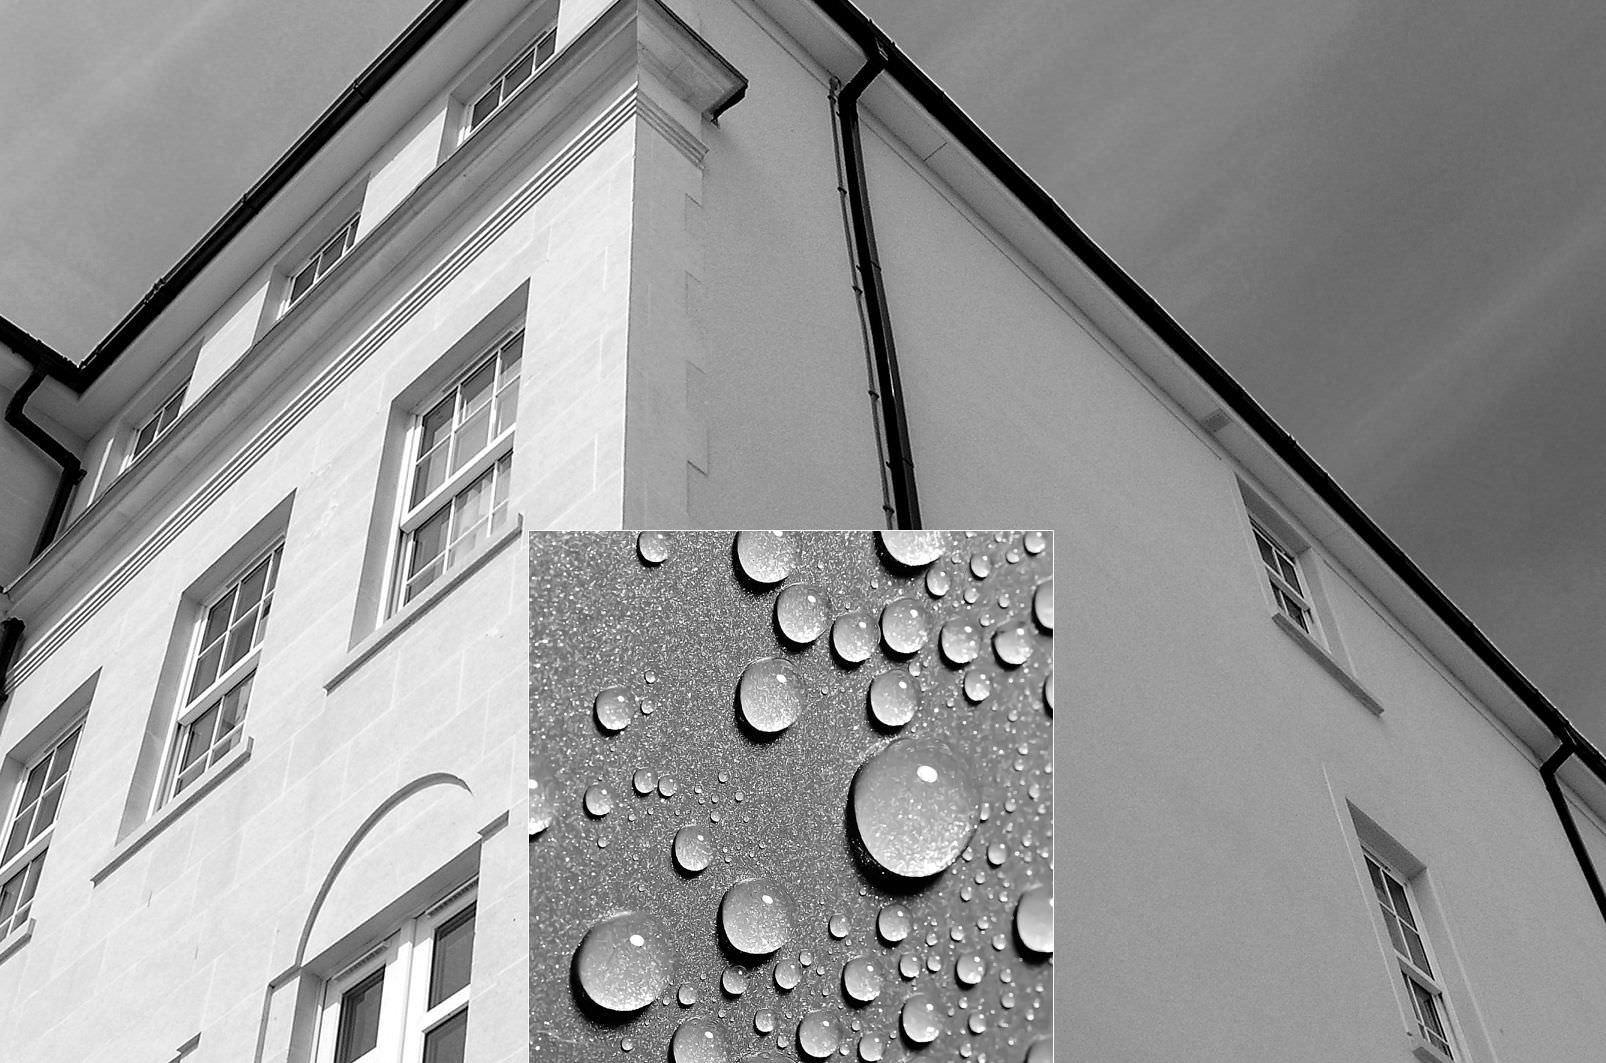 Pintura de silicona: Su uso para proteger muros exteriores